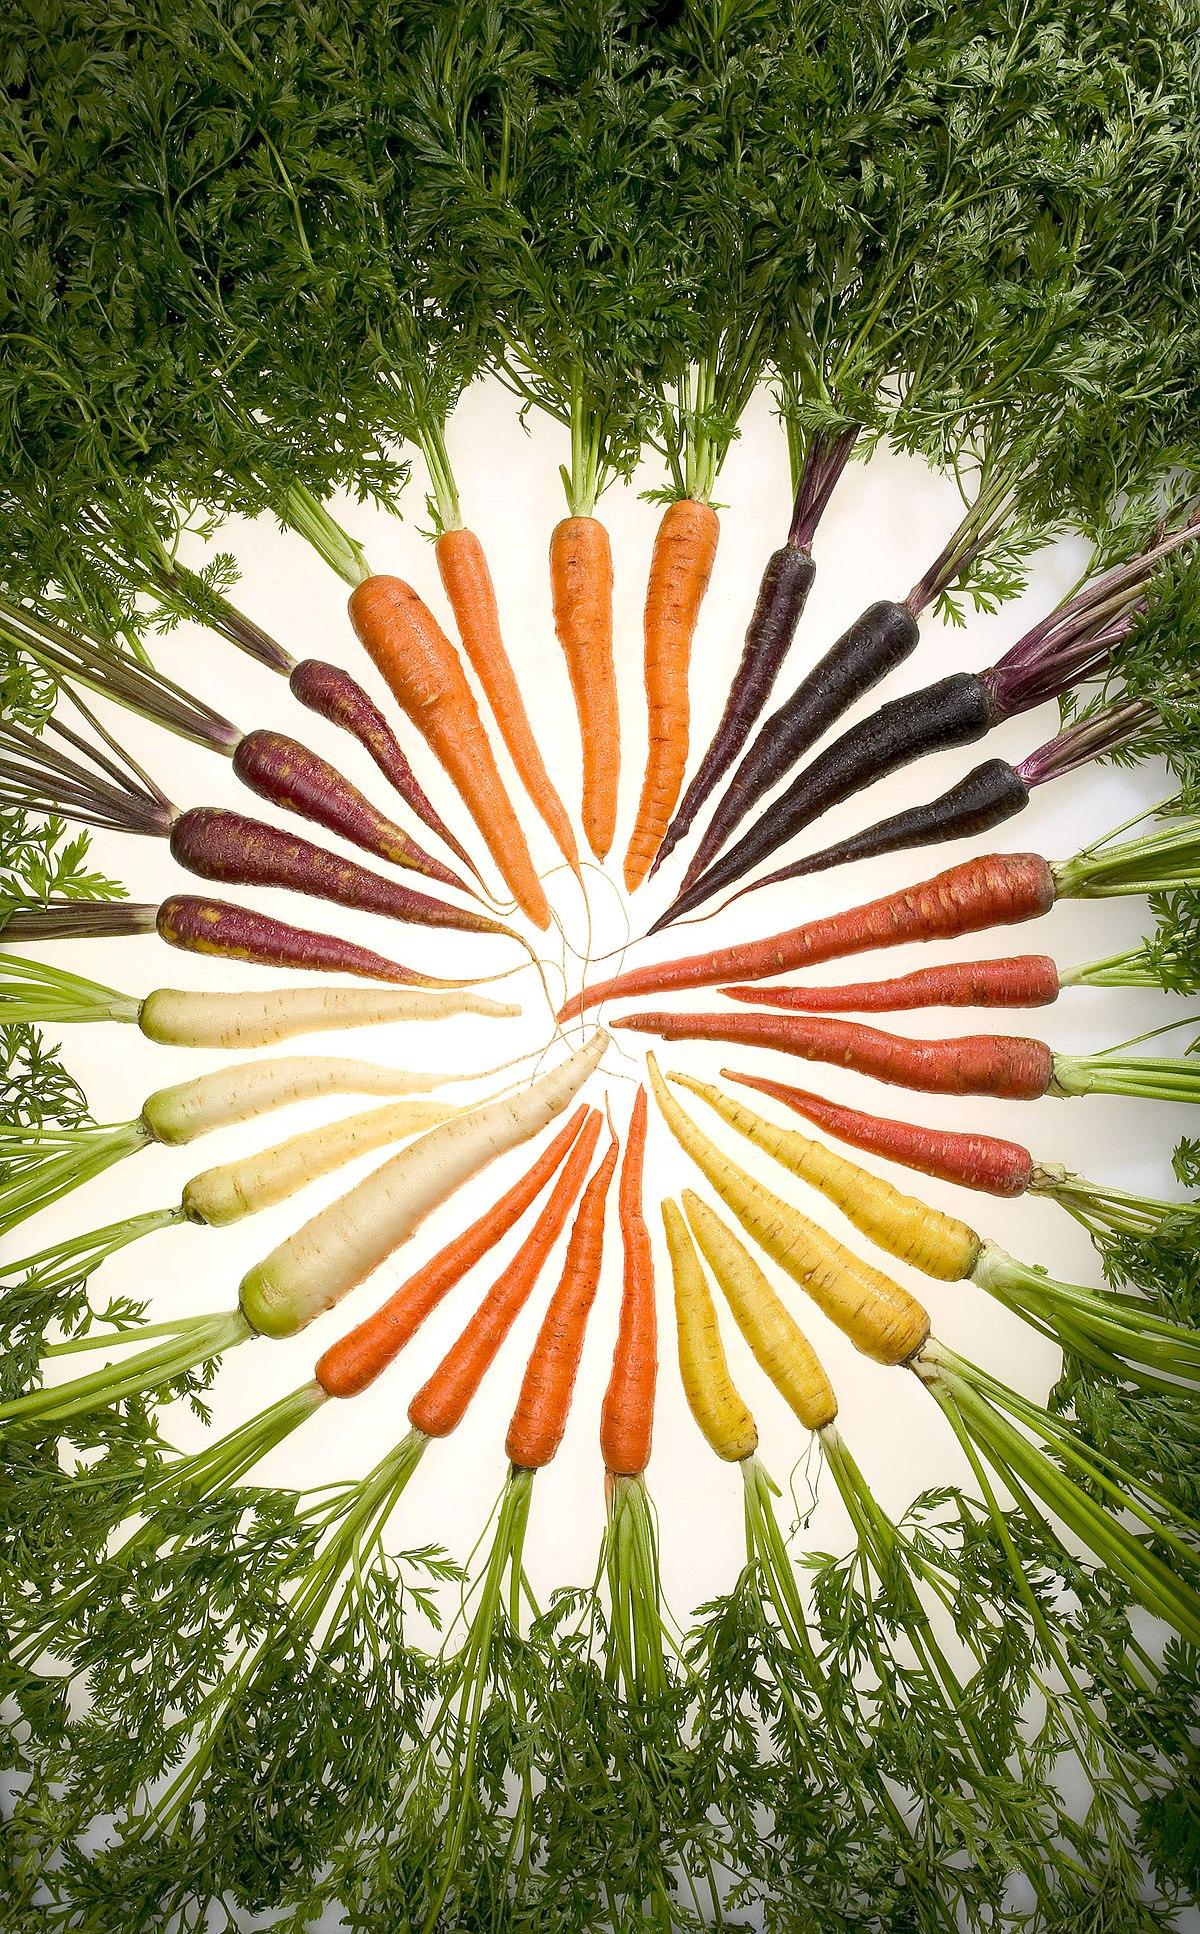 Carrots of many colors.jpg